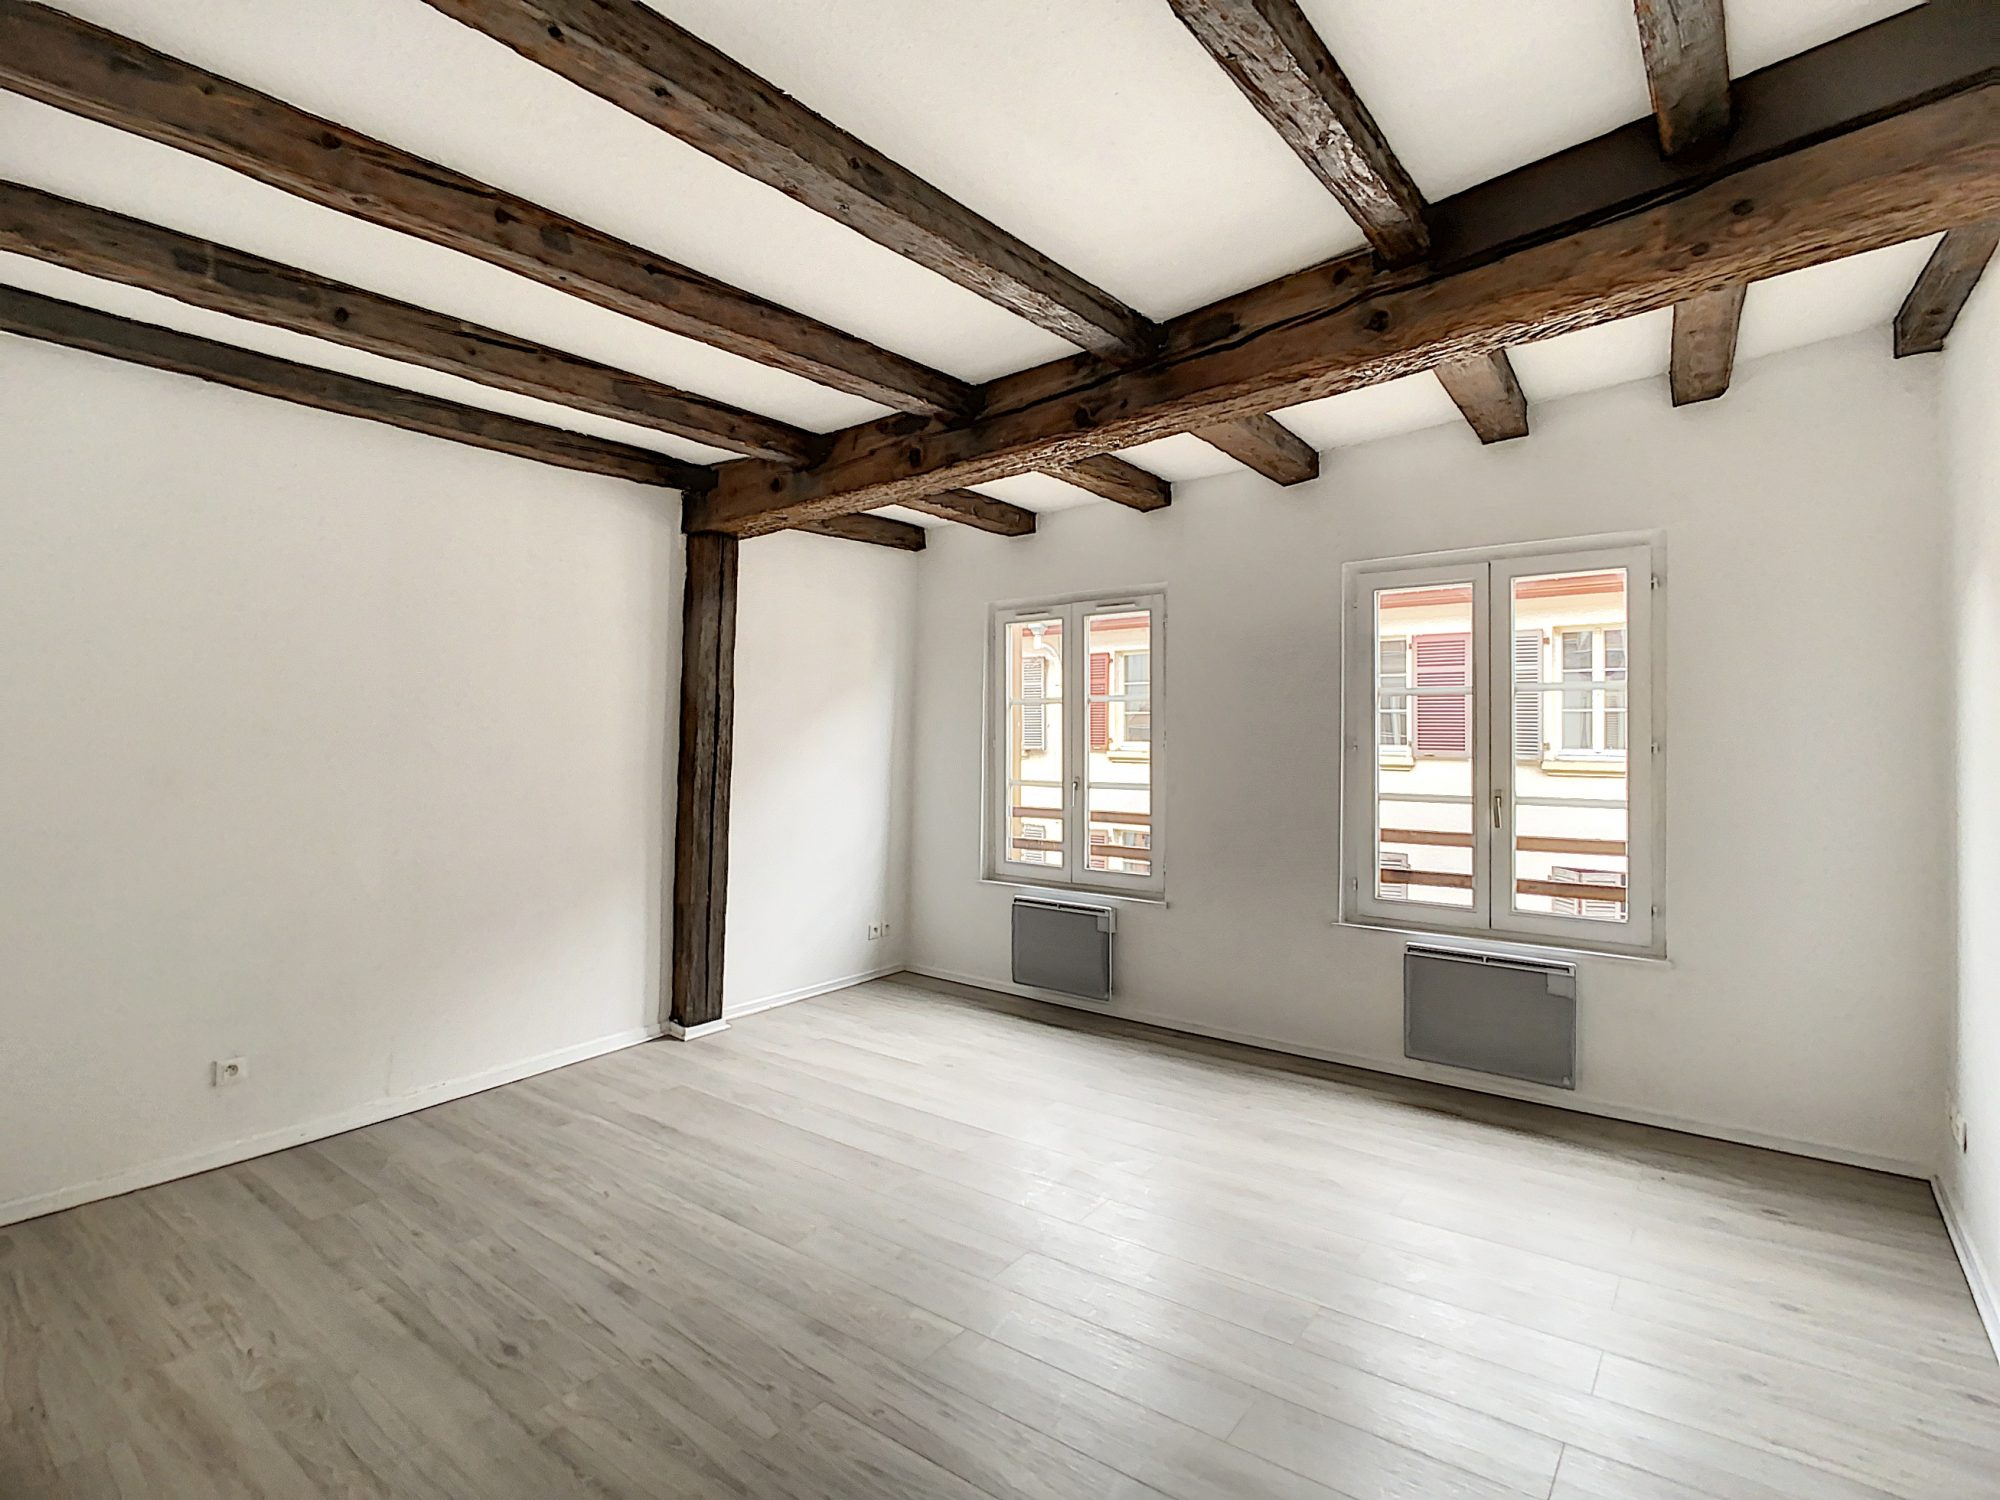 GRAND RUE - 2 pcs duplex  48.96 m2